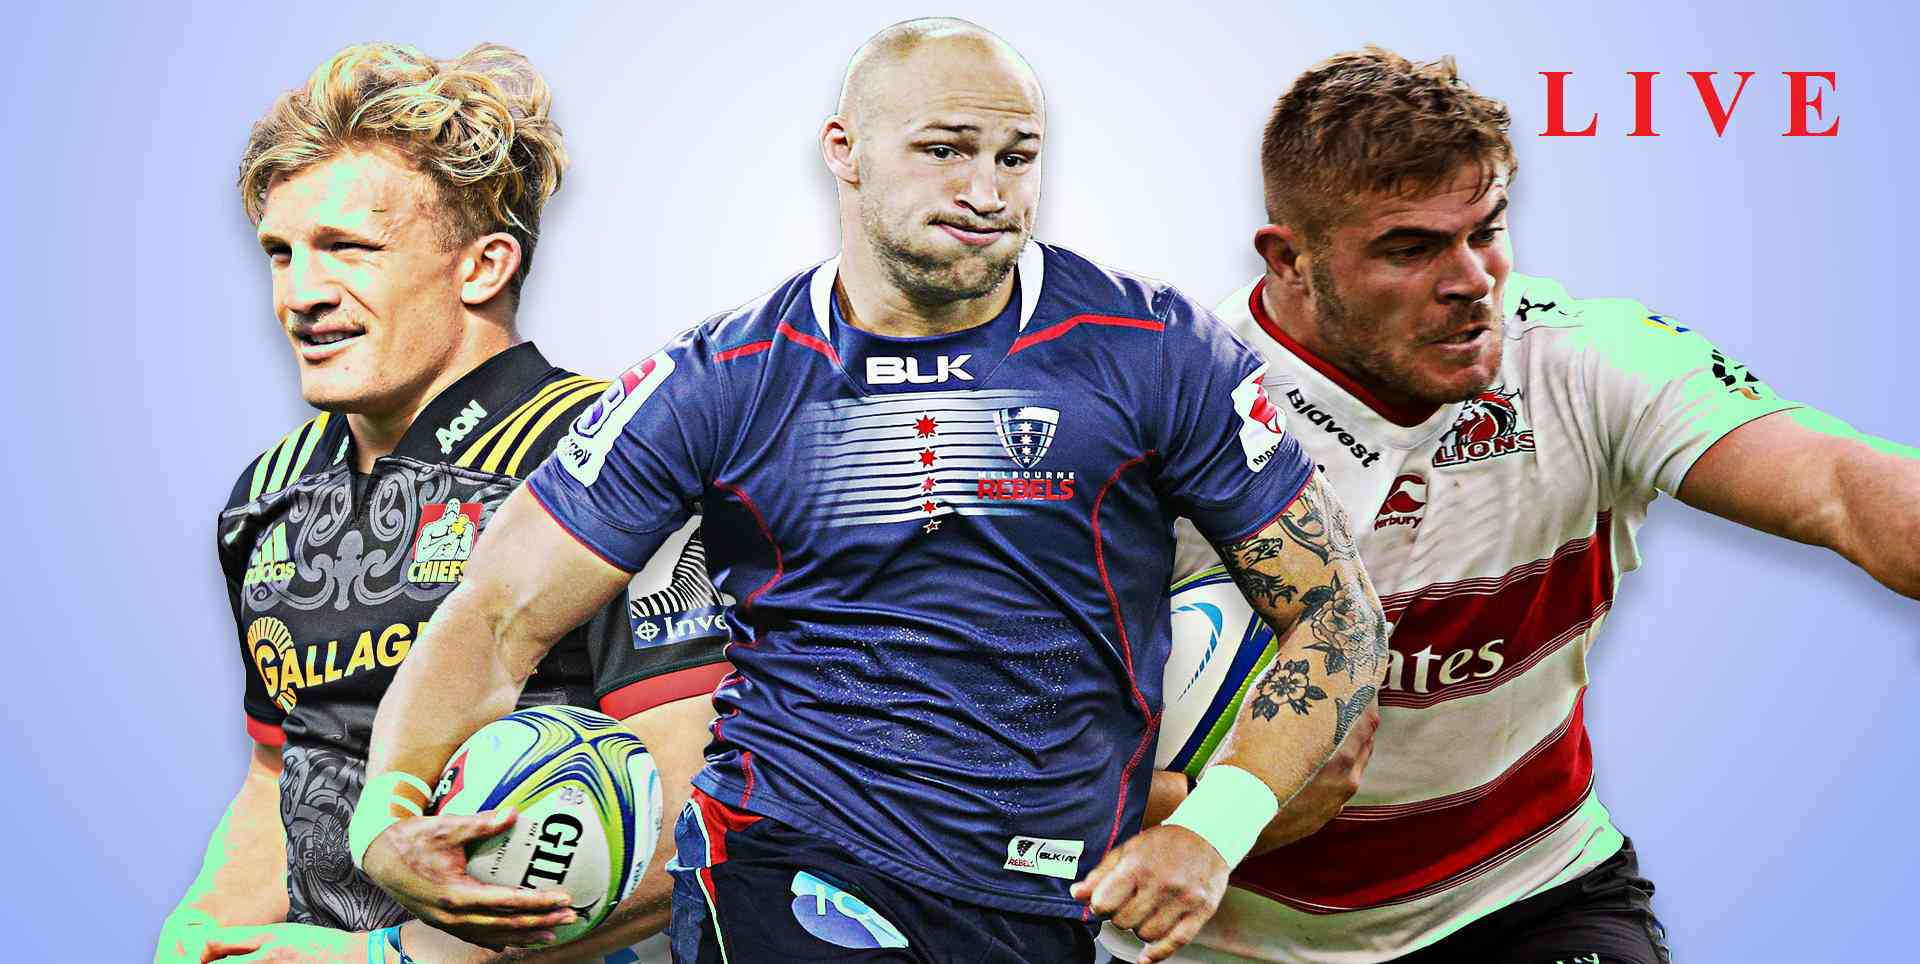 Round 5 Sharks vs Cheetahs Highlights Super Rugby 2017